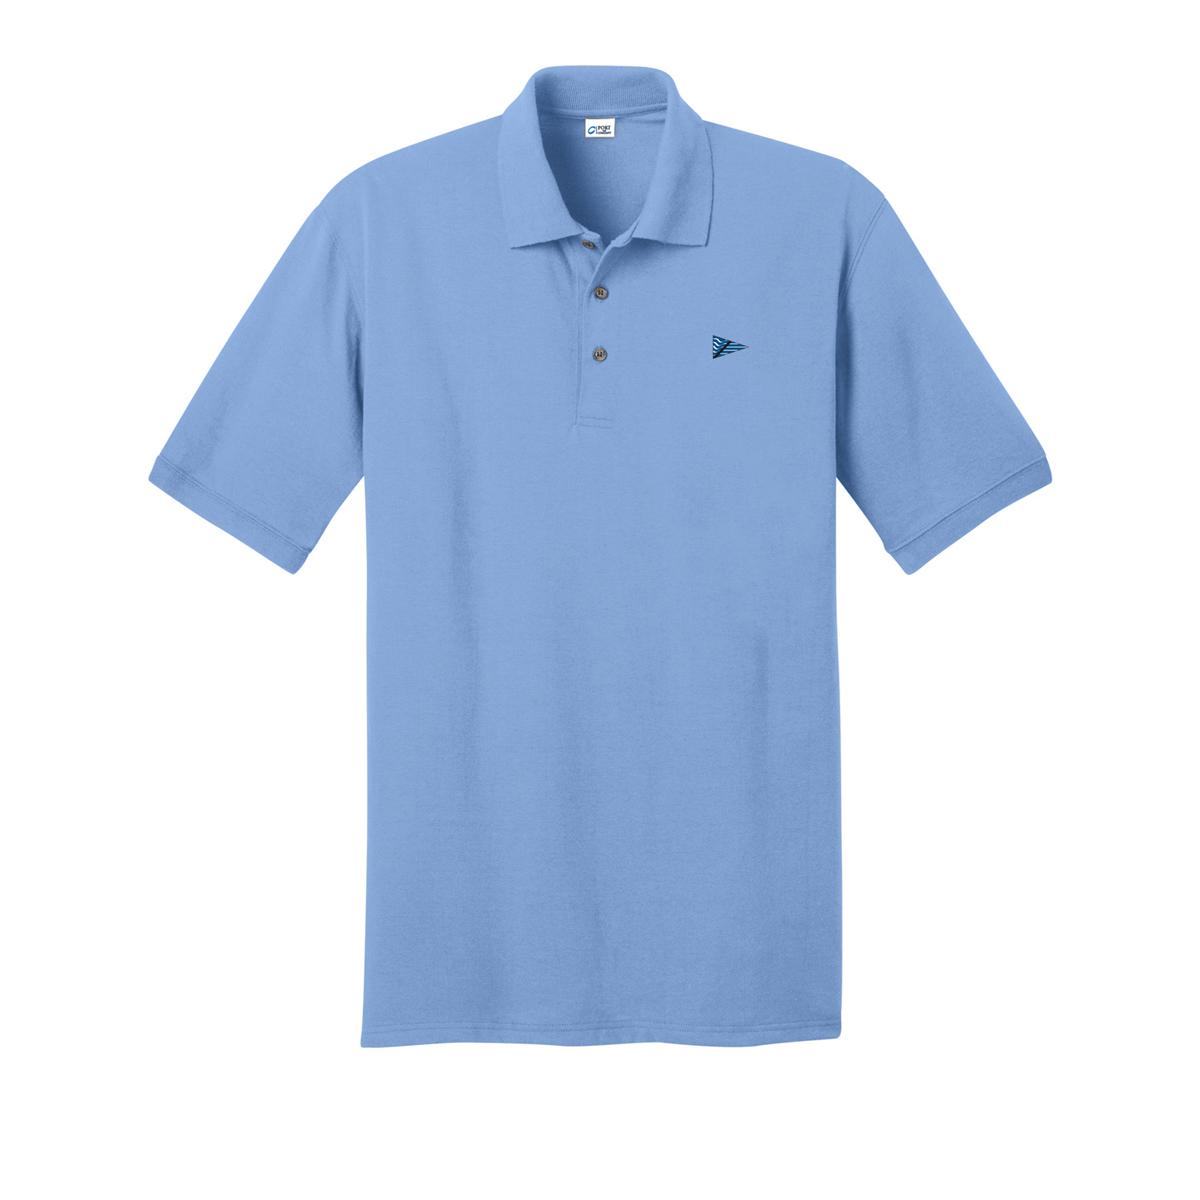 Breakwater Yacht Club-M's Cotton Polo